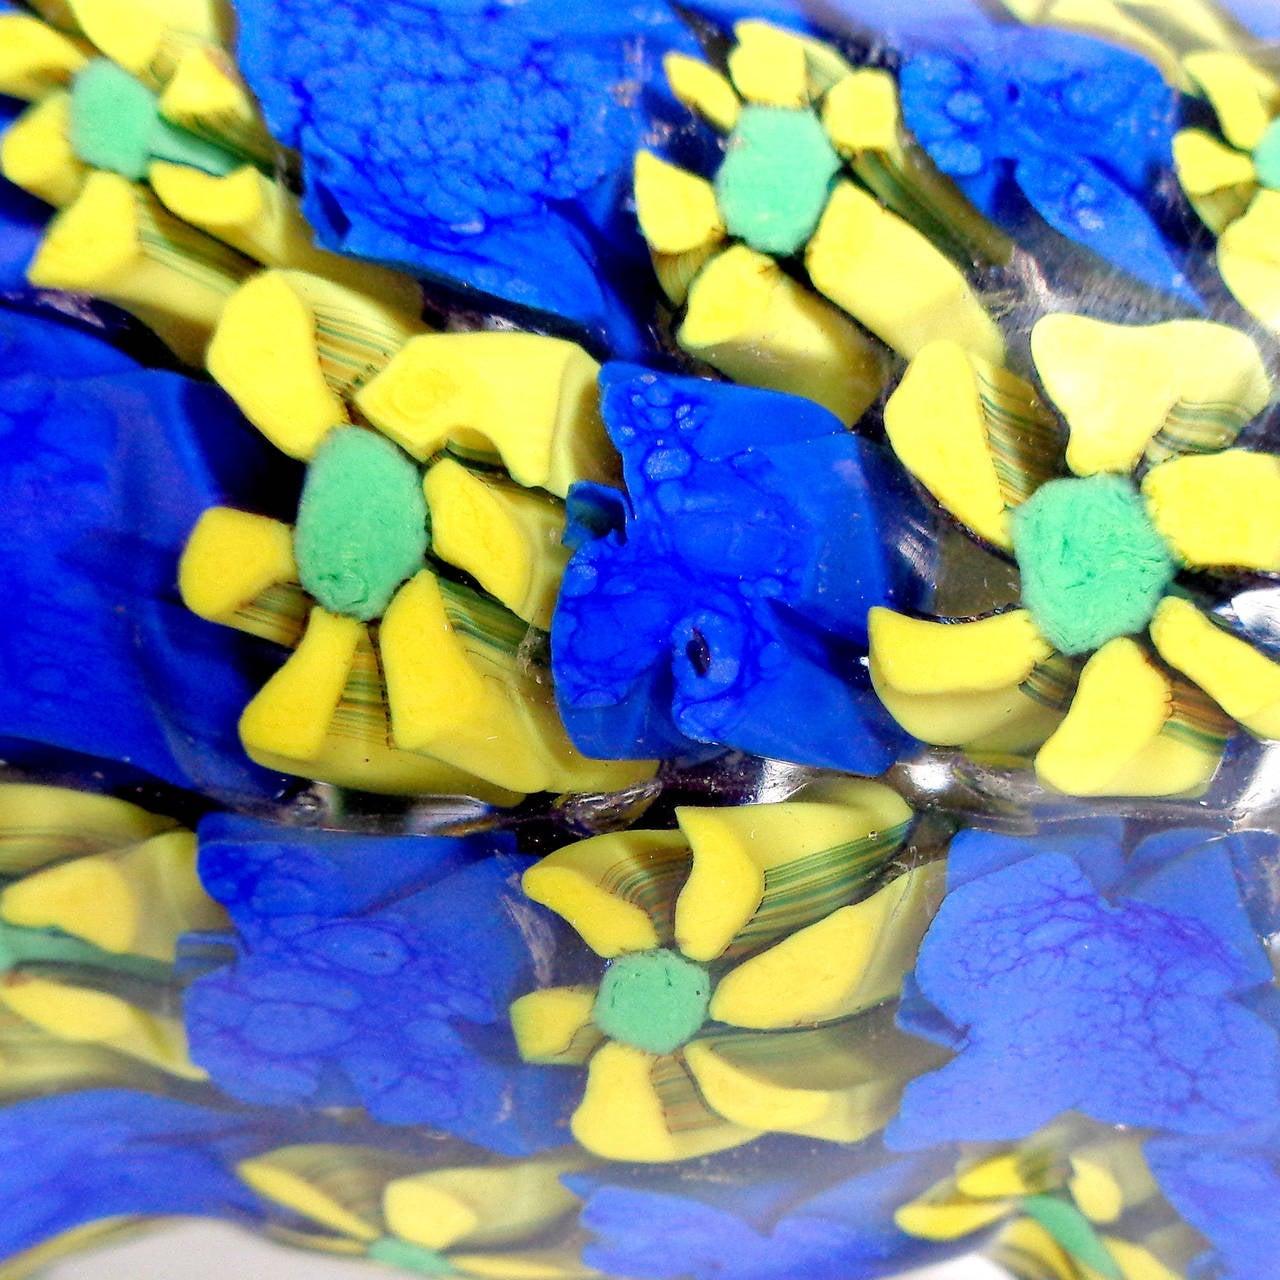 Fratelli Toso Murano Yellow And Blue Millefiori Flower Mosaic